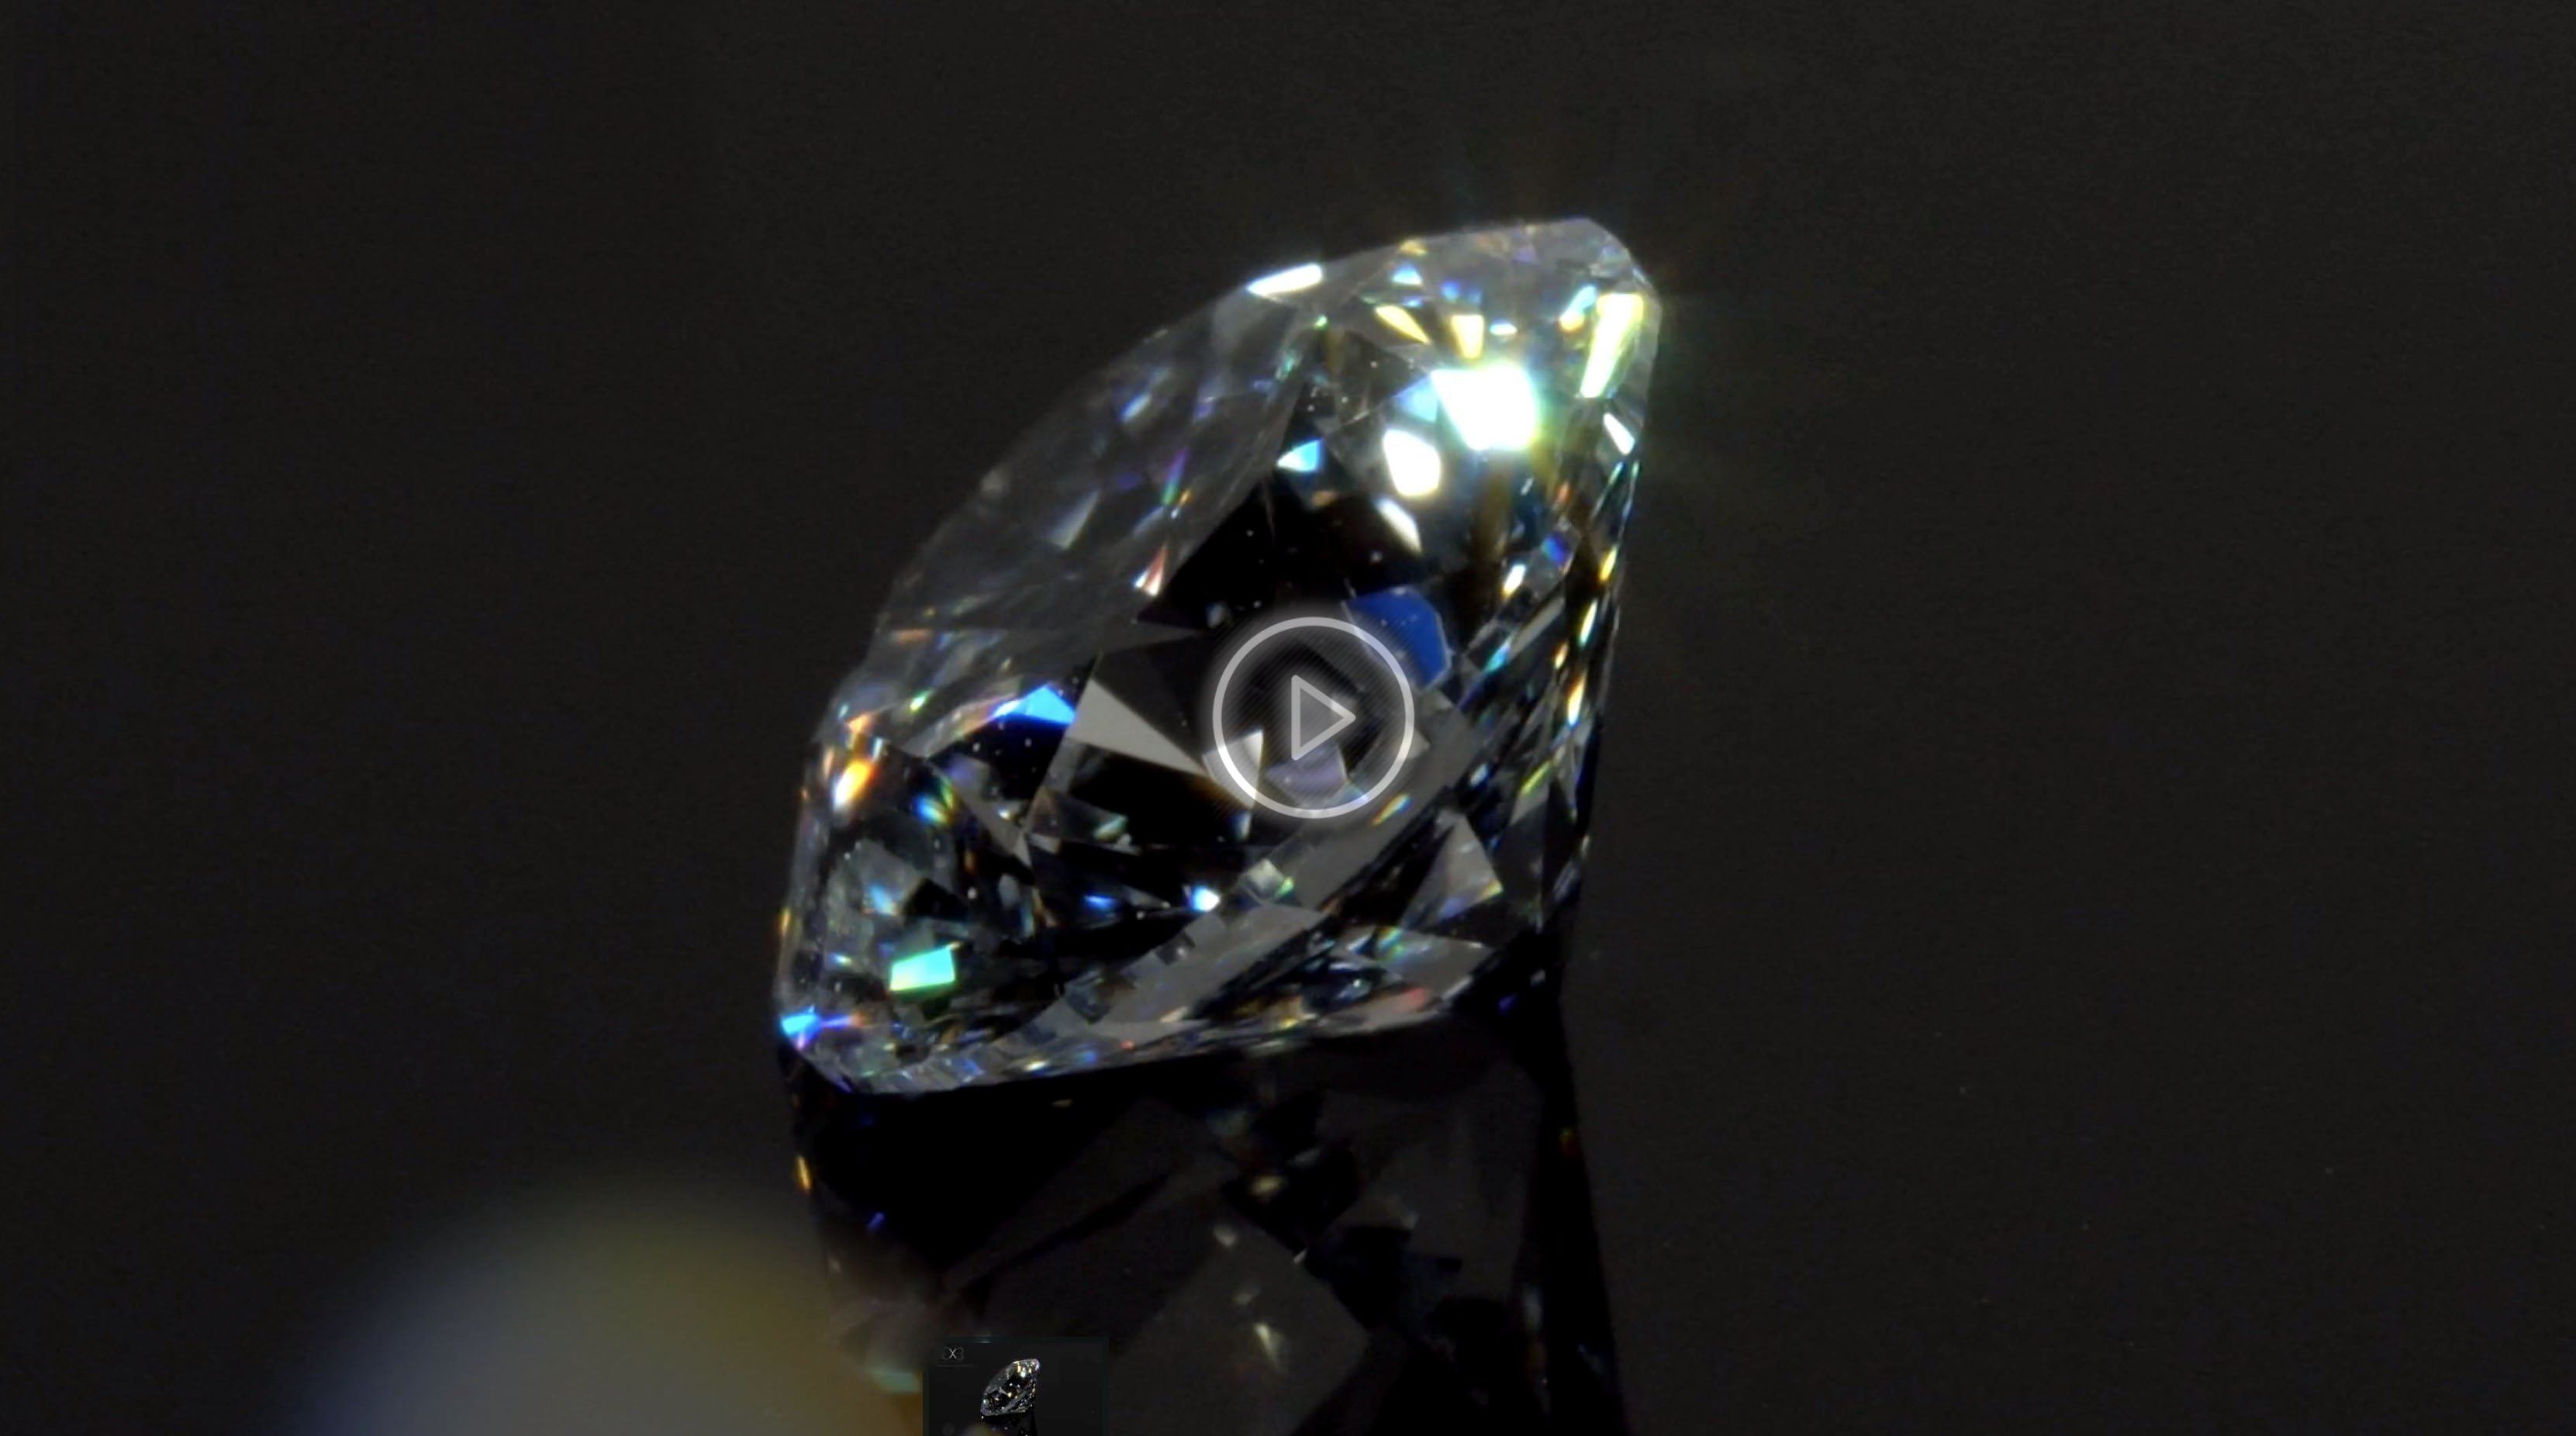 Diamonds Videography